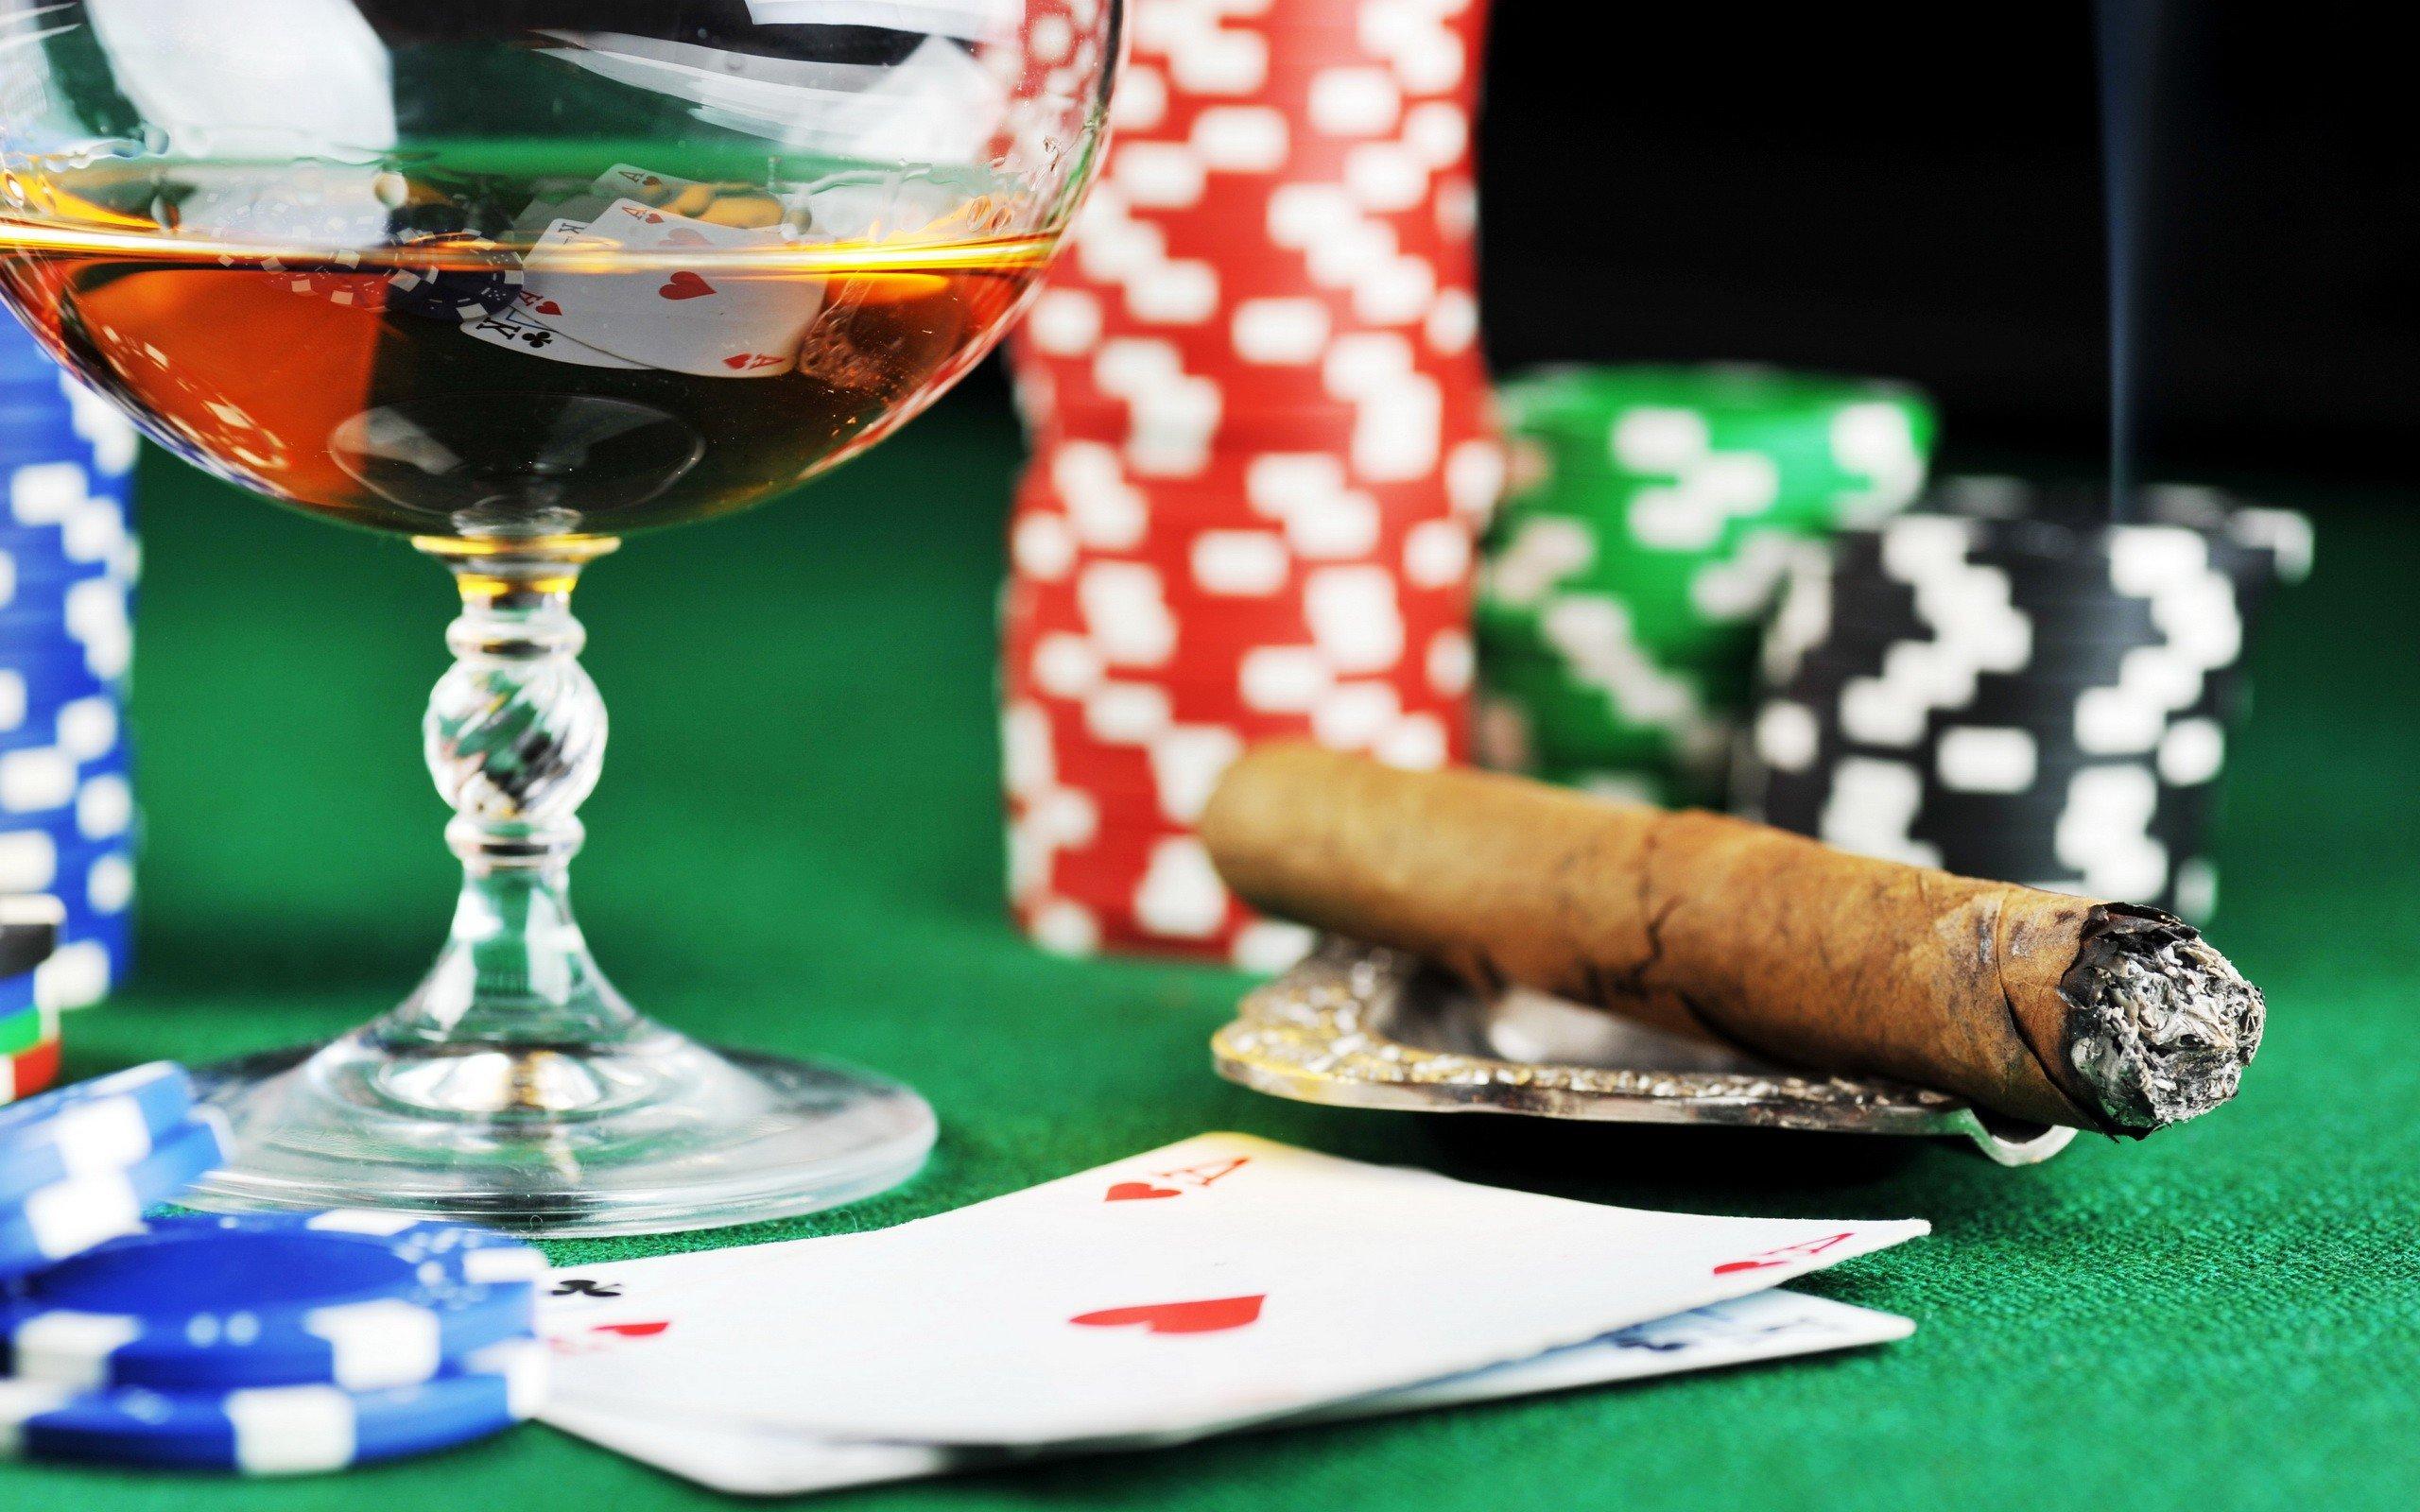 Poker poker chips Casino cigars wallpaper 2560x1600 304765 2560x1600